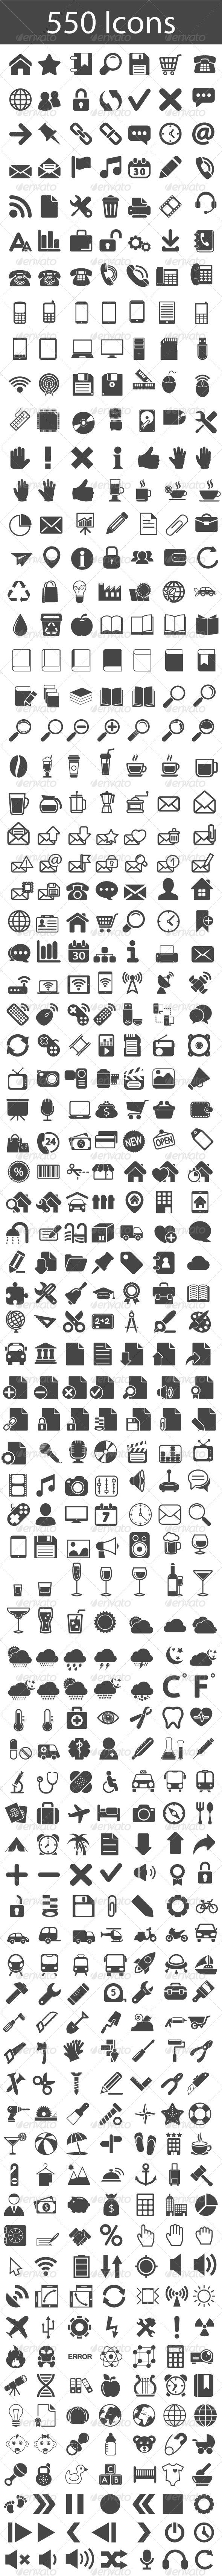 GraphicRiver Icons Set 5813243